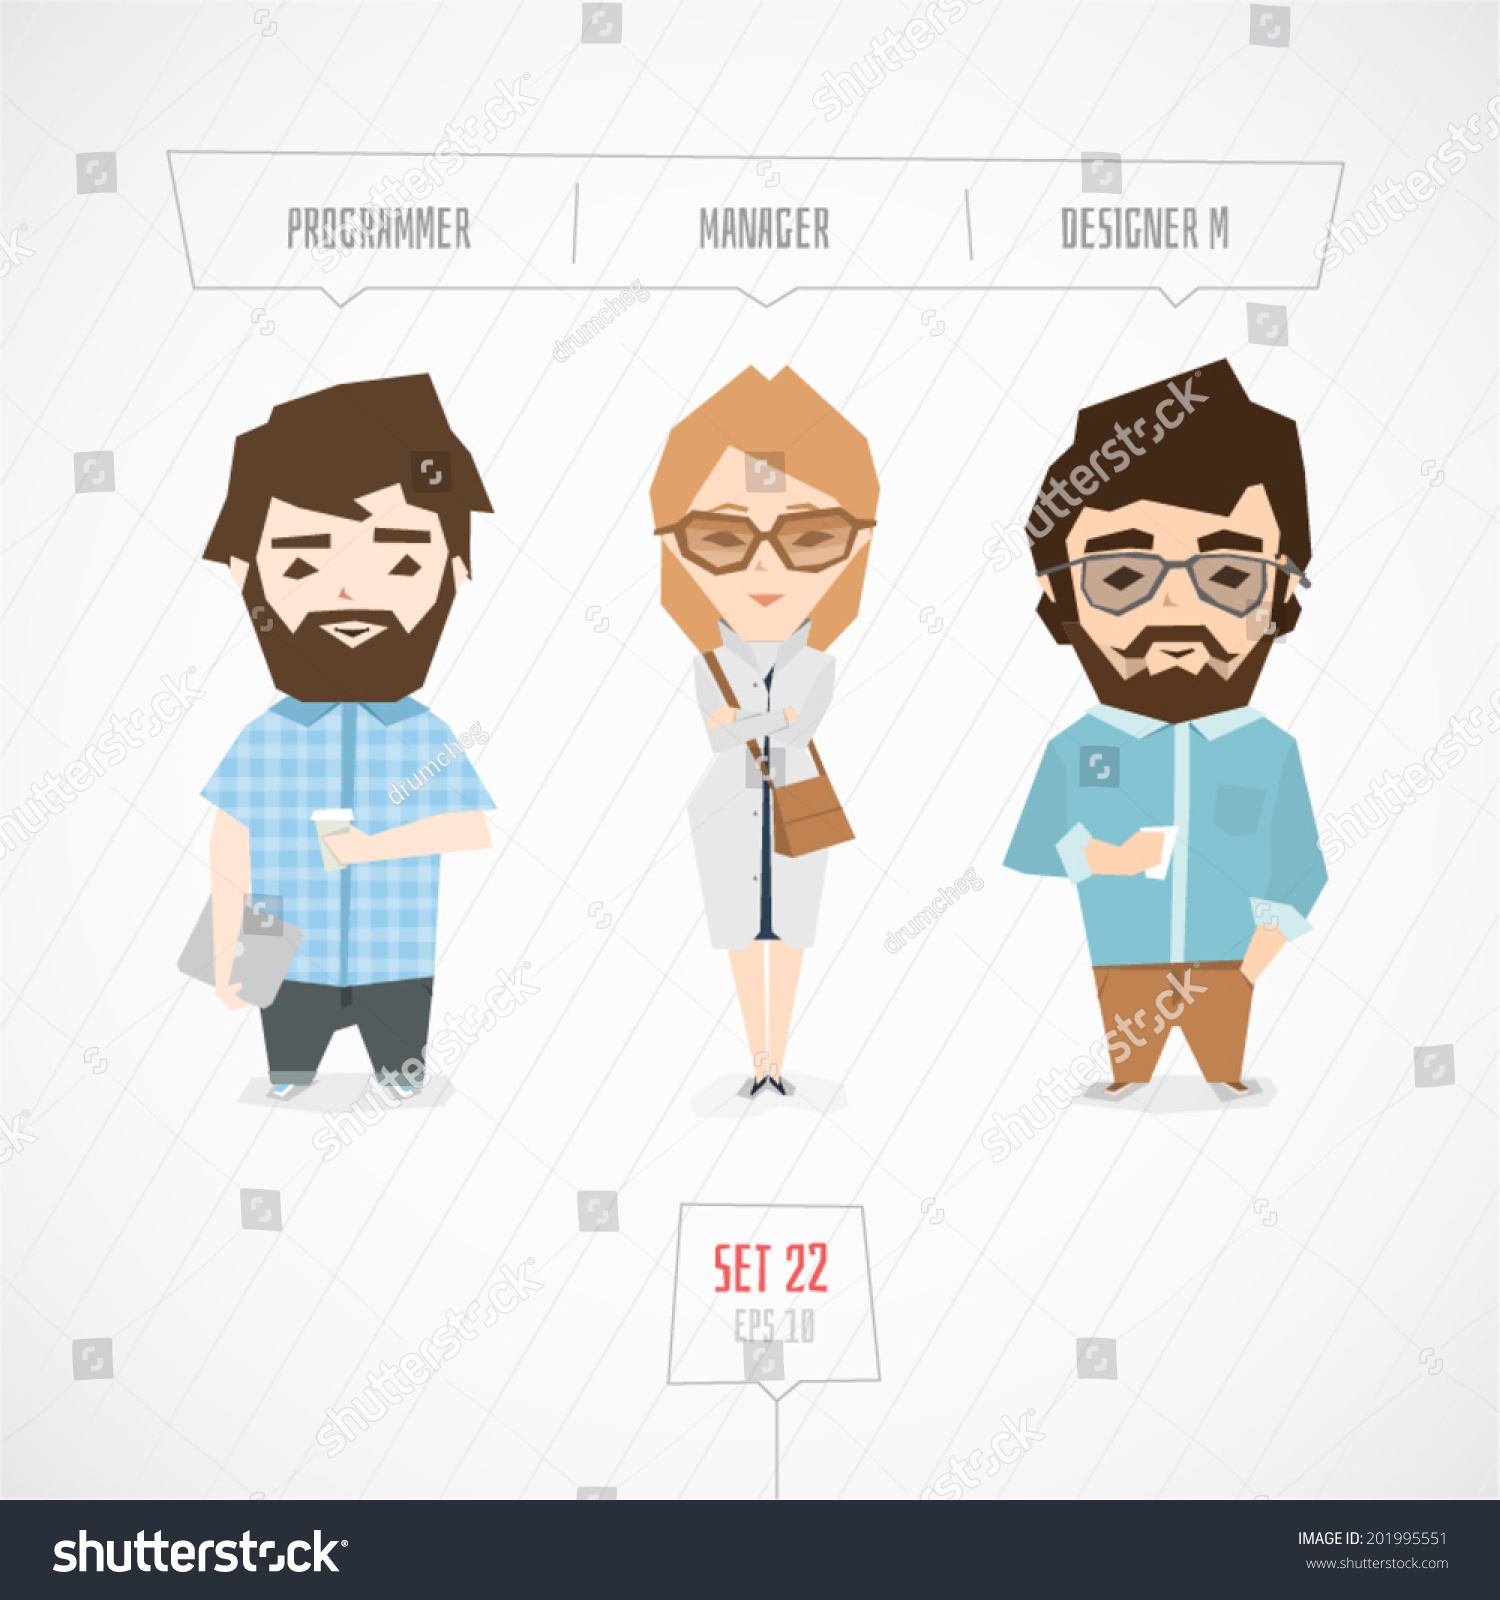 Cartoon Character Design Website : Cartoon characters programmer manager designer vector